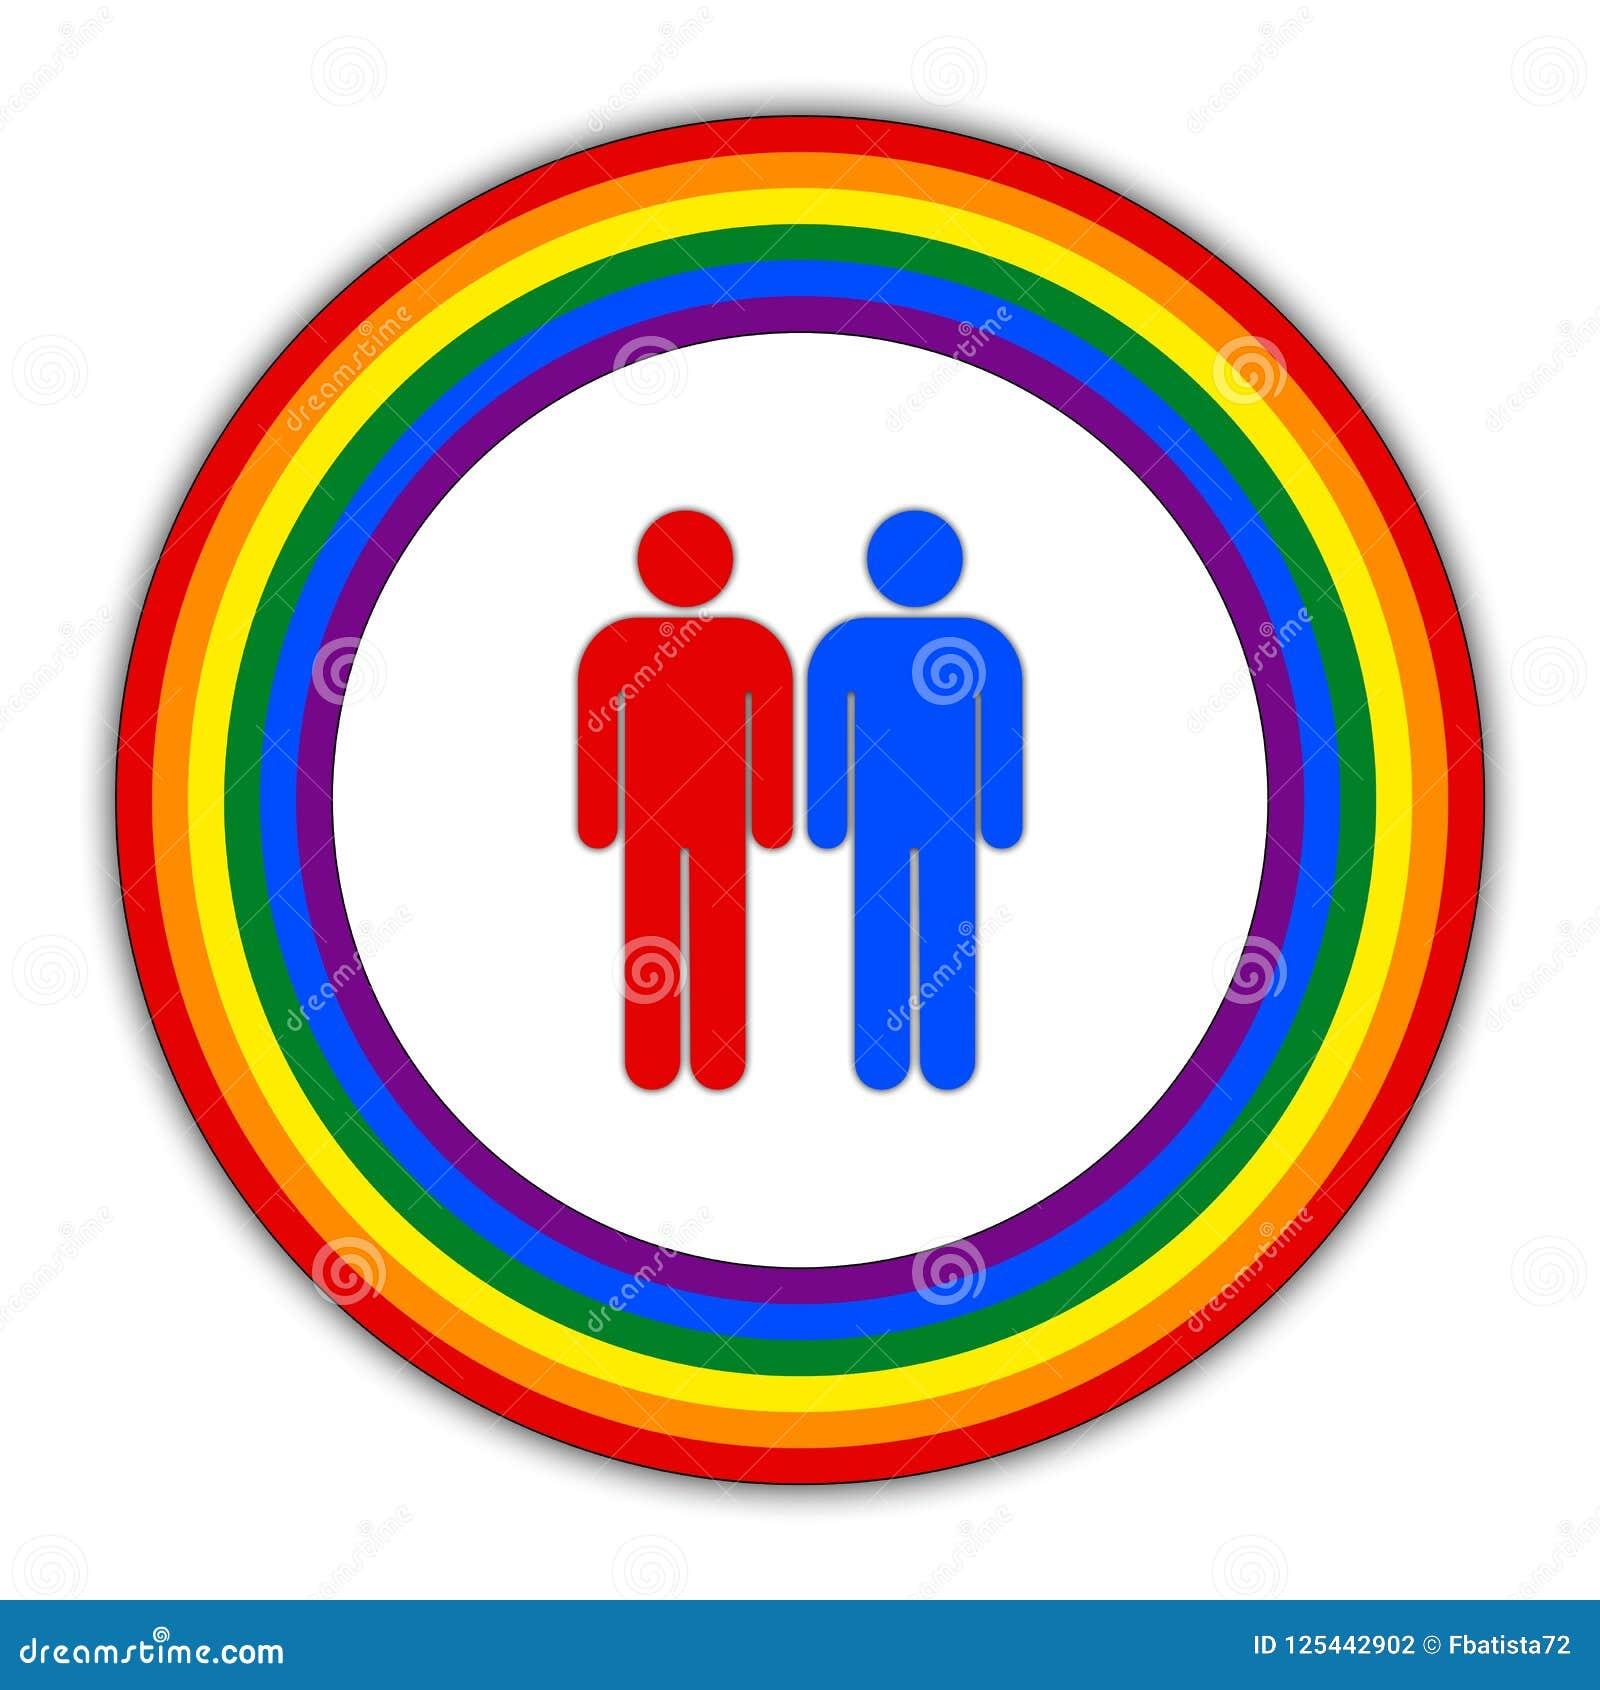 Rainbow Gay Couple Pride Flag Circle Symbol Of Sexual Minorities